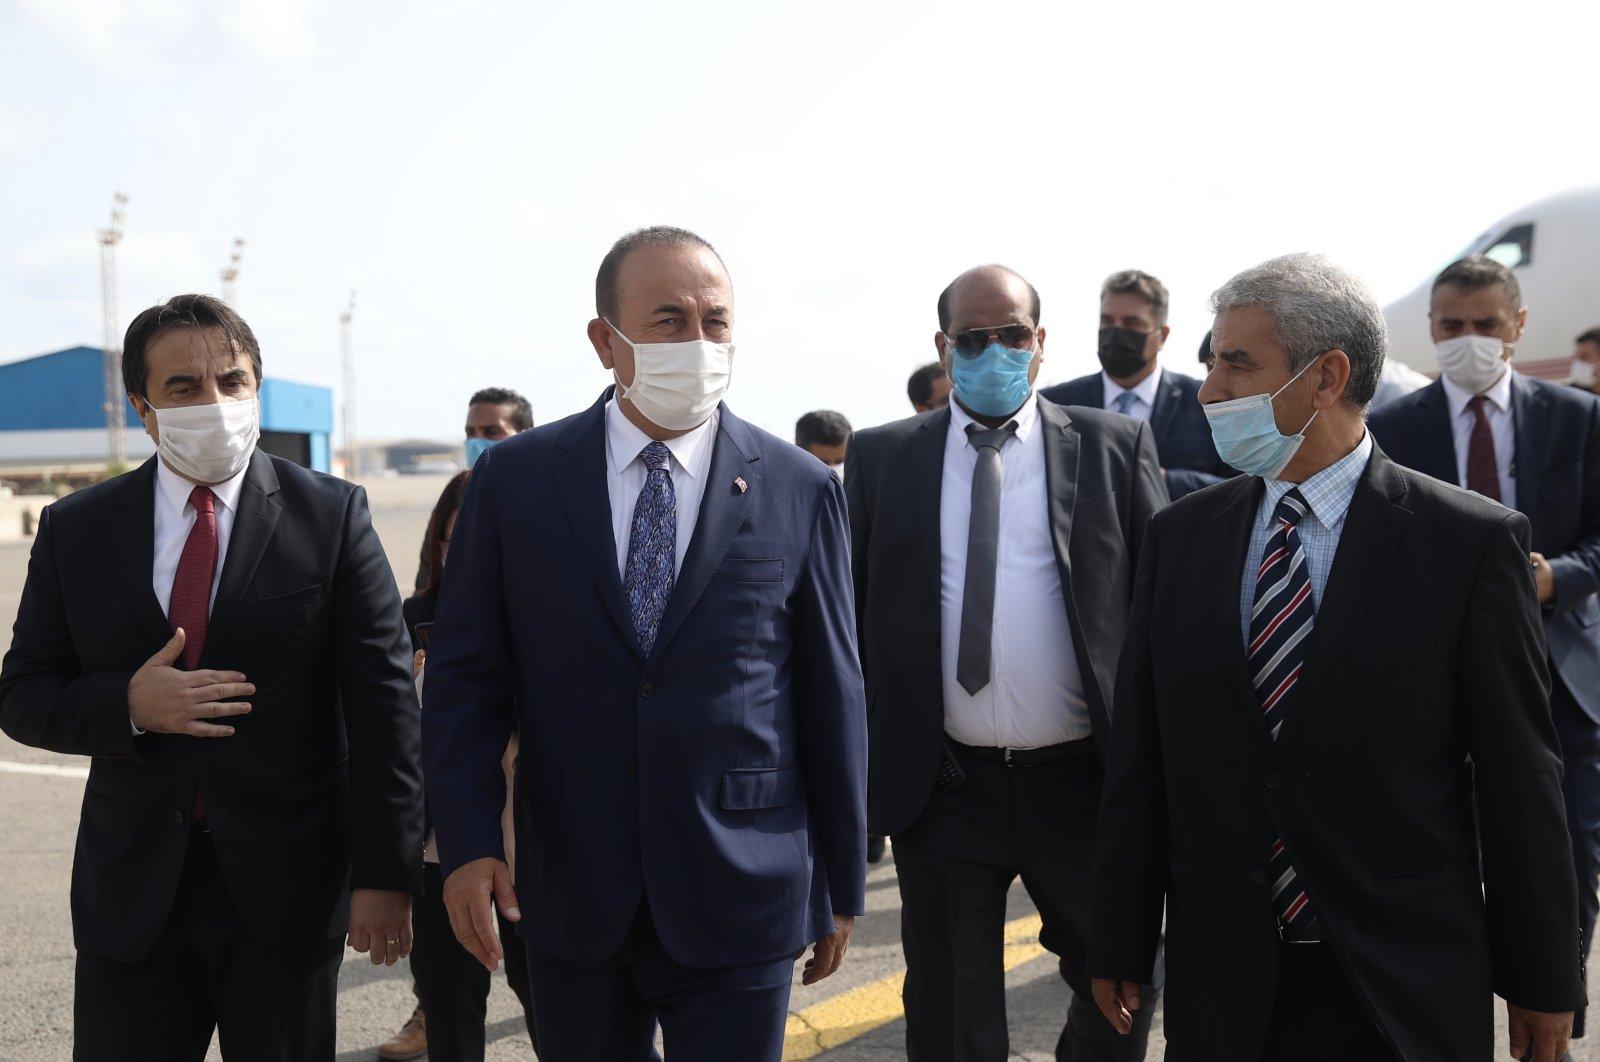 Foreign Minister Mevlüt Çavuşoğlu (C) and Malta's Foreign Minister Evarist Bartolo (R) walk on the tarmac afterlanding in Tripoli, Libya, Aug. 6, 2020. (AA)